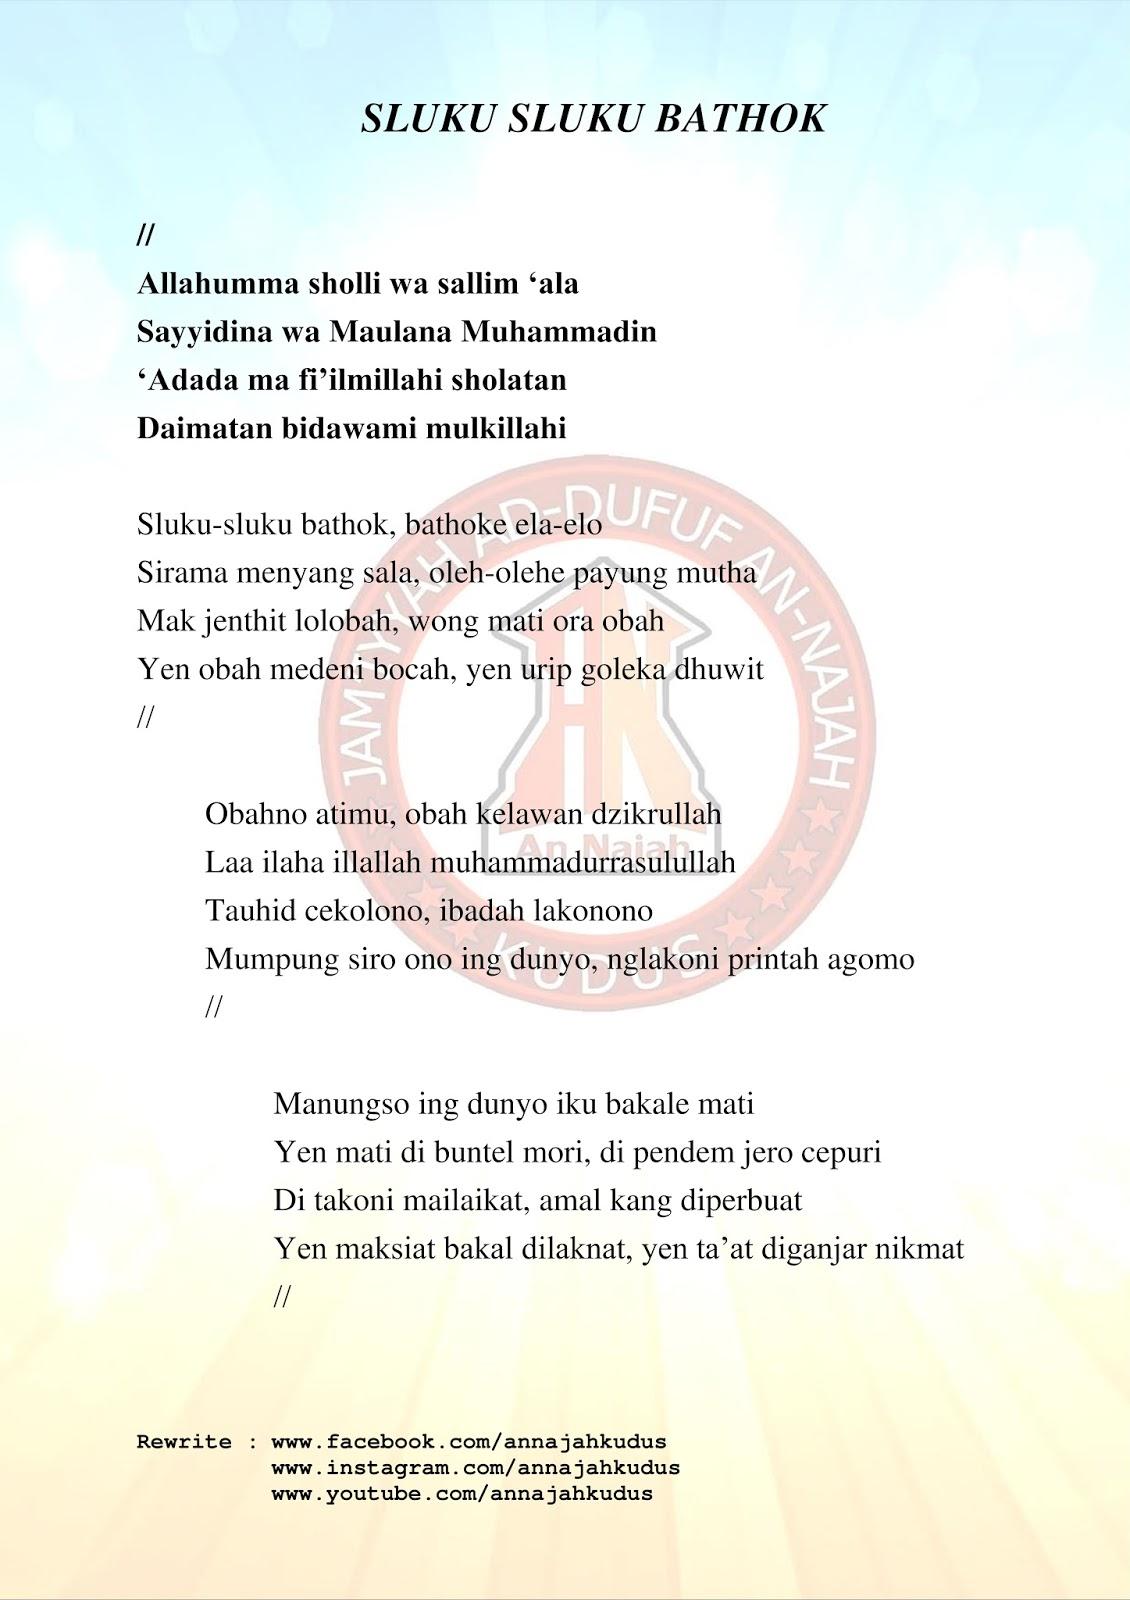 Lagu Sluku Sluku Batok : sluku, batok, SLUKU, BATHOK, NAJAH, KUDUS